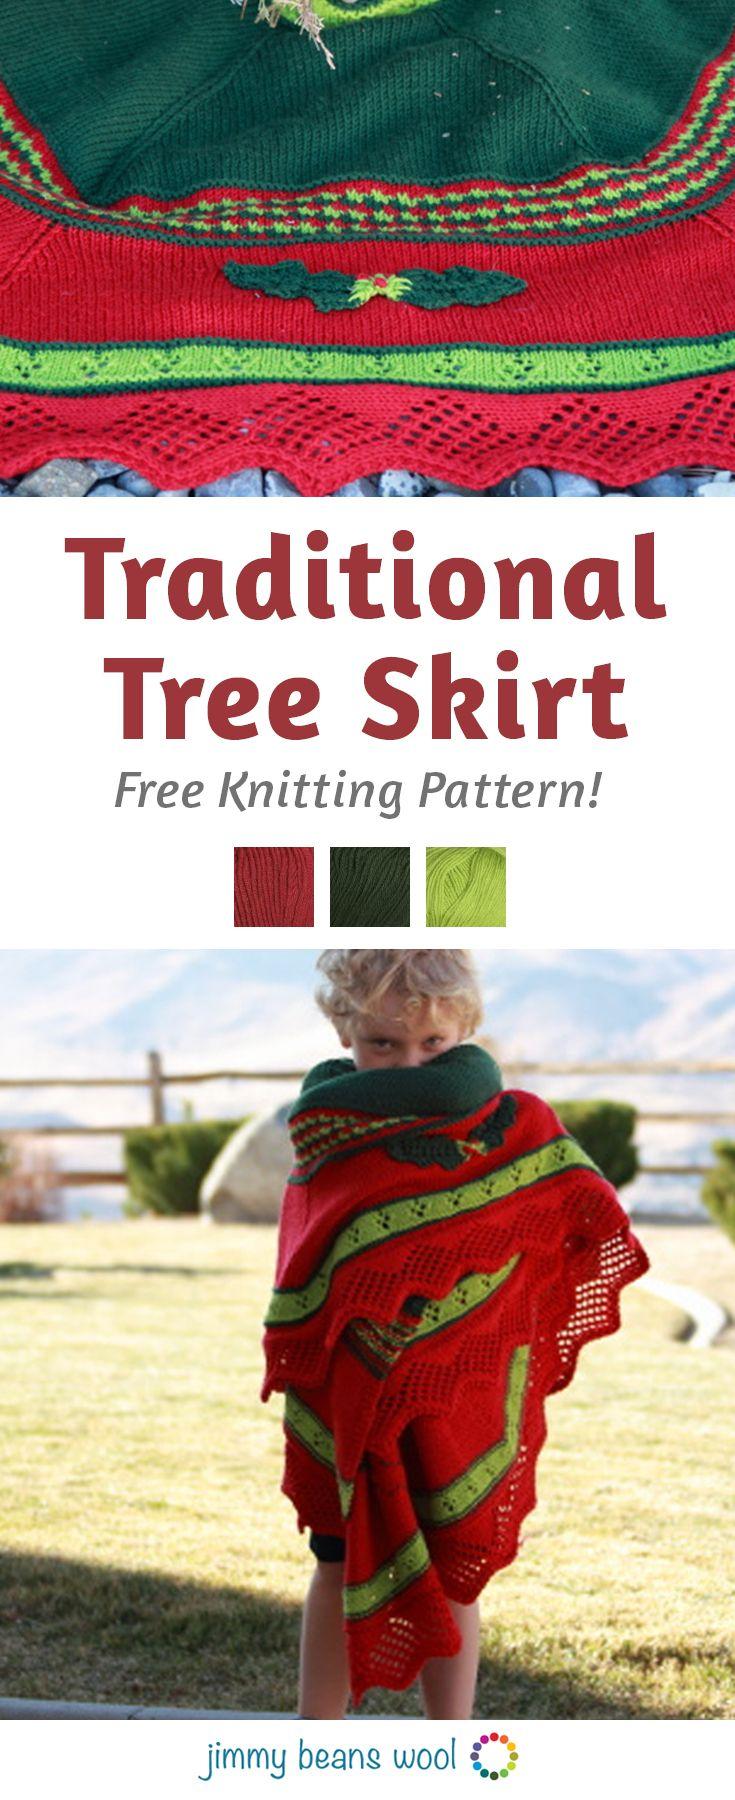 Traditional Tree Skirt Free Knitting Pattern | Knitting For ...